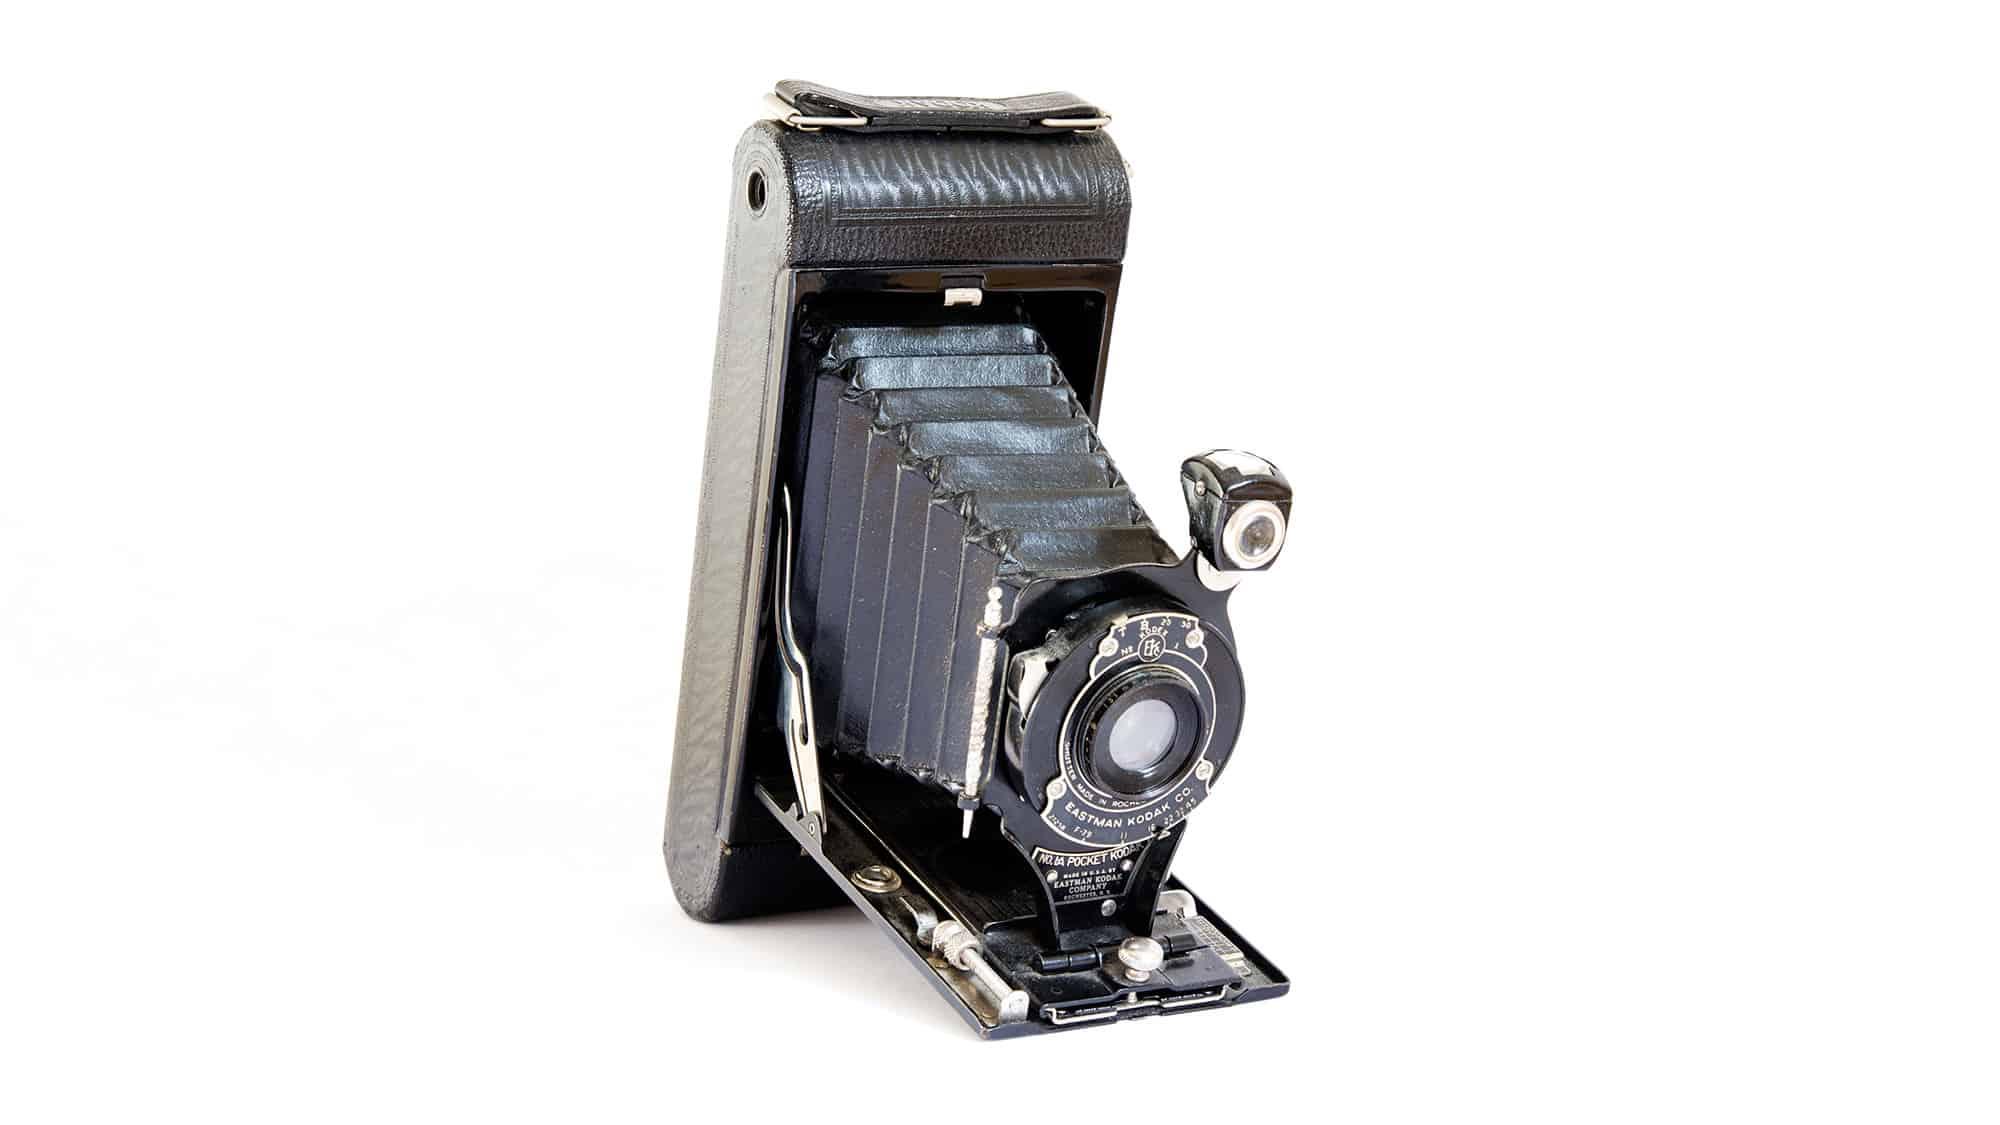 Kodak 1a pocket folding camera.